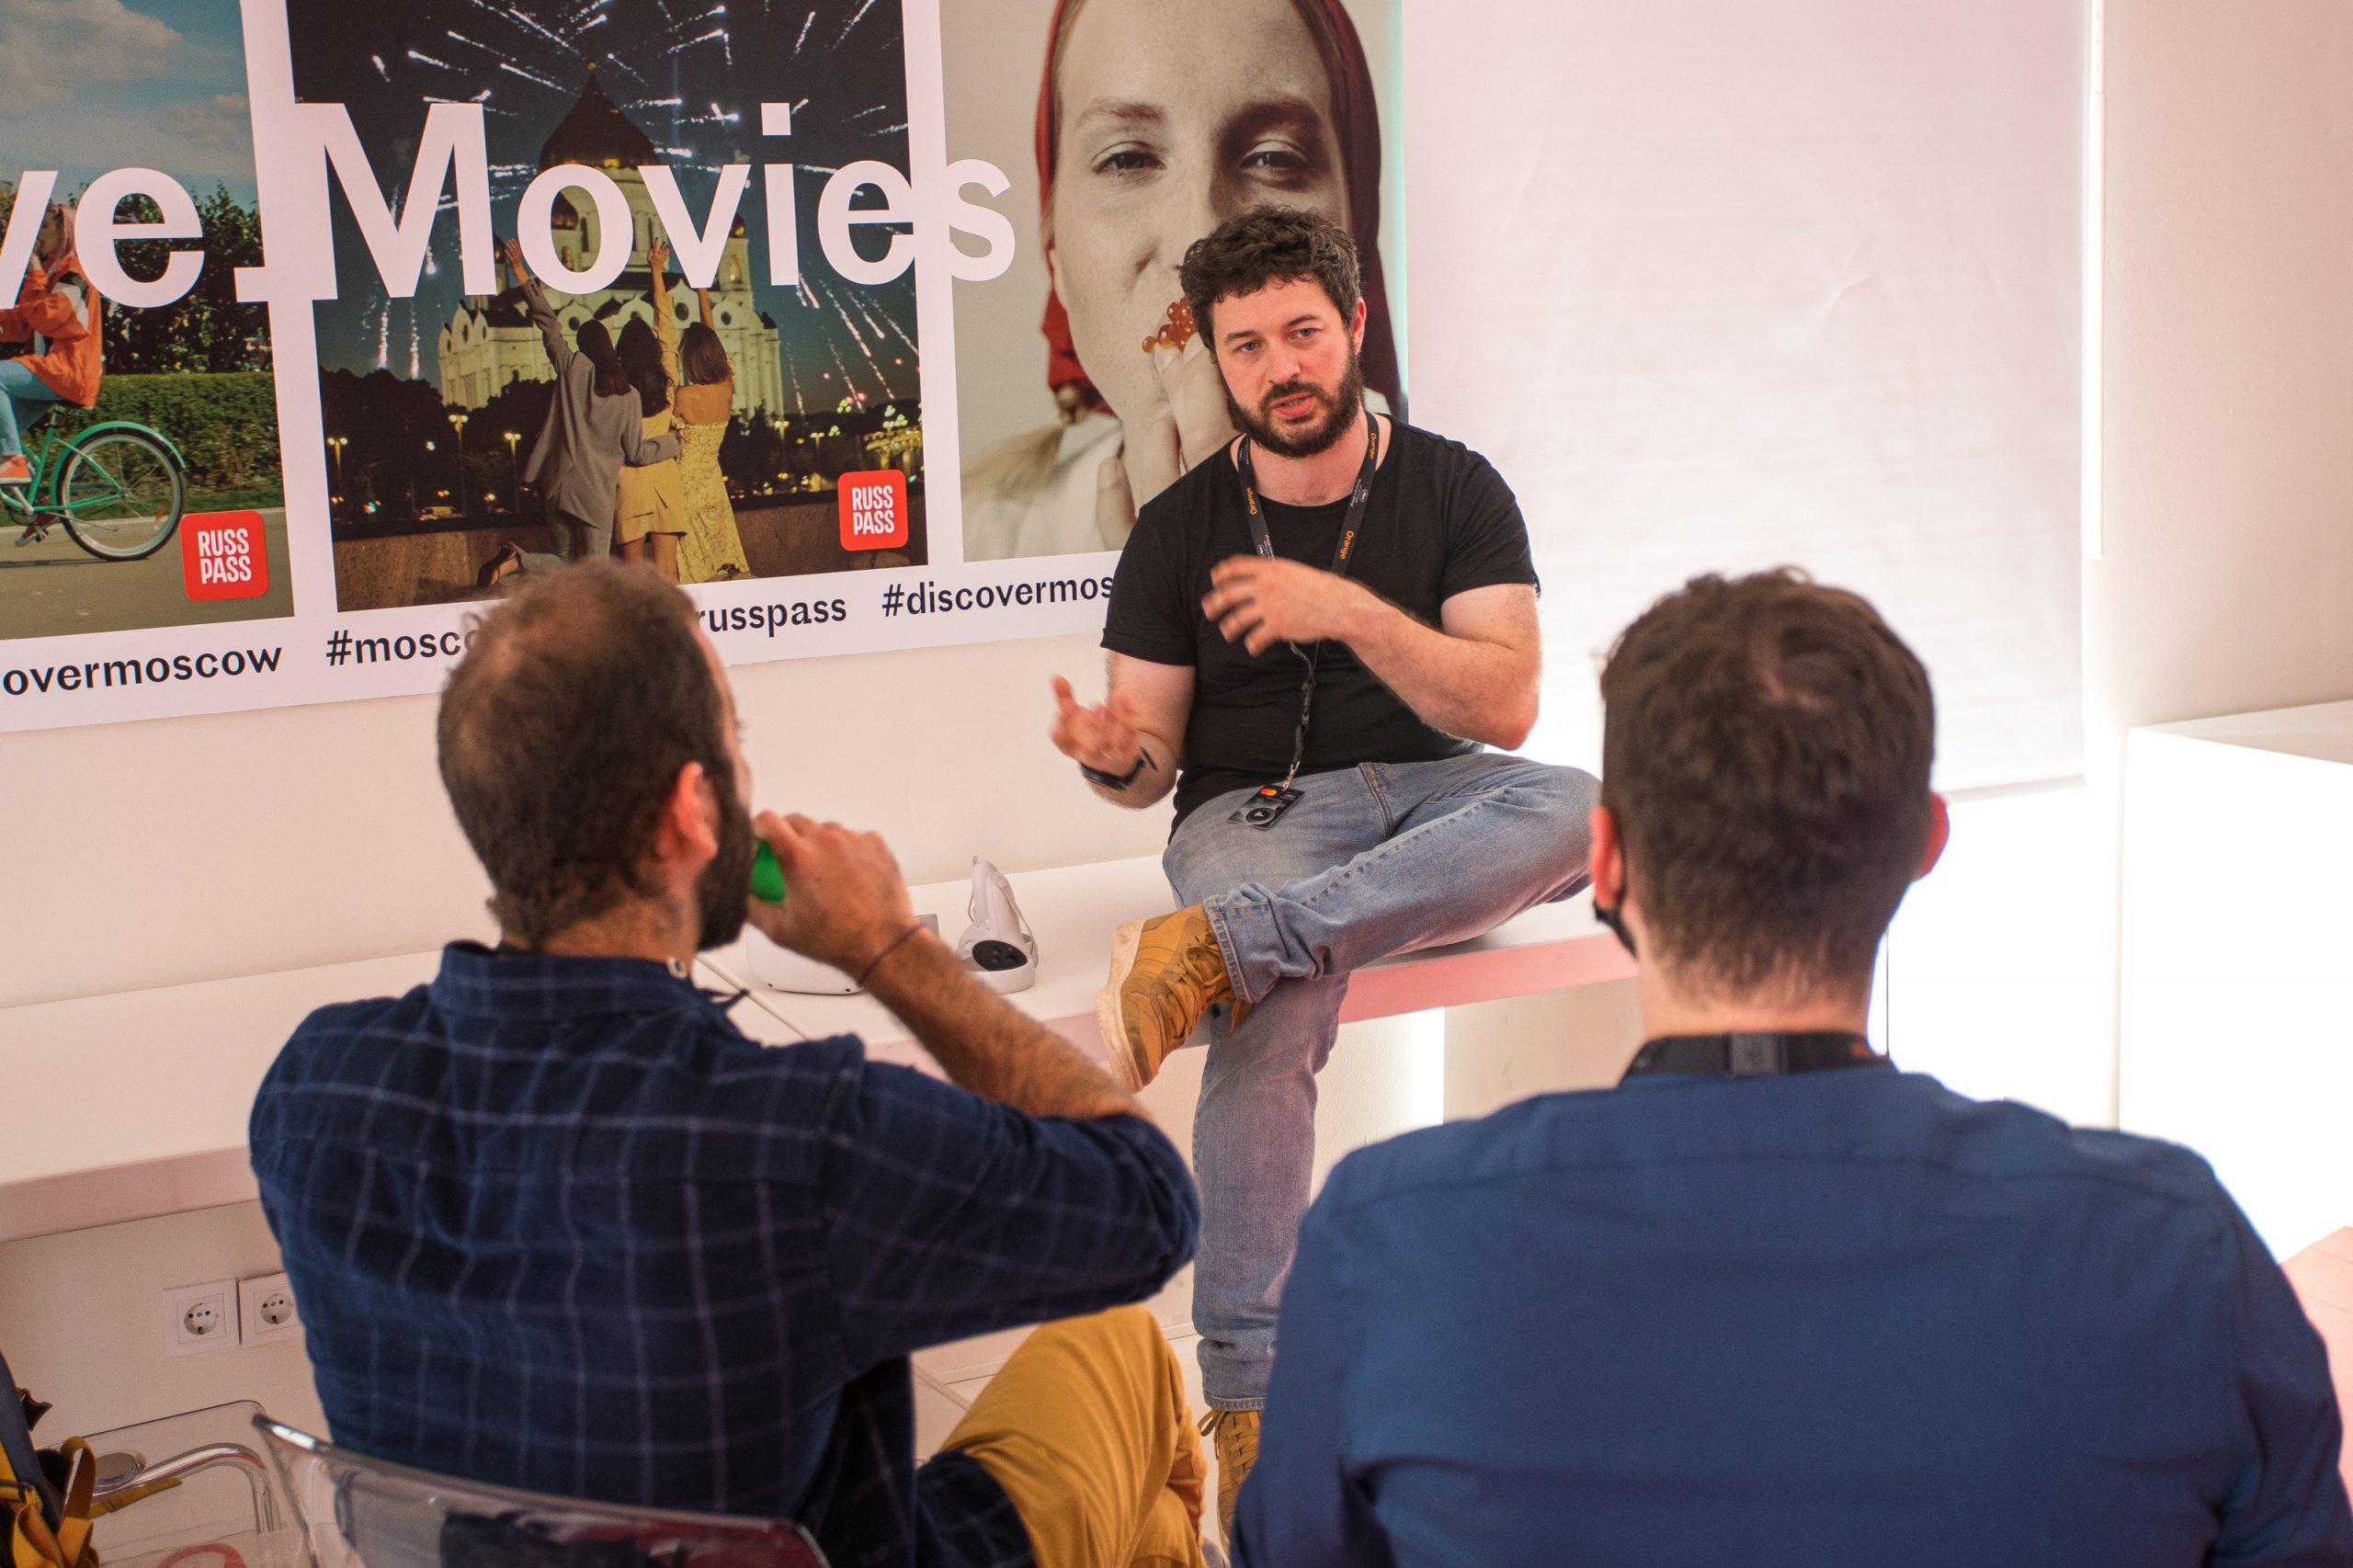 Director Georgy Molodtsov